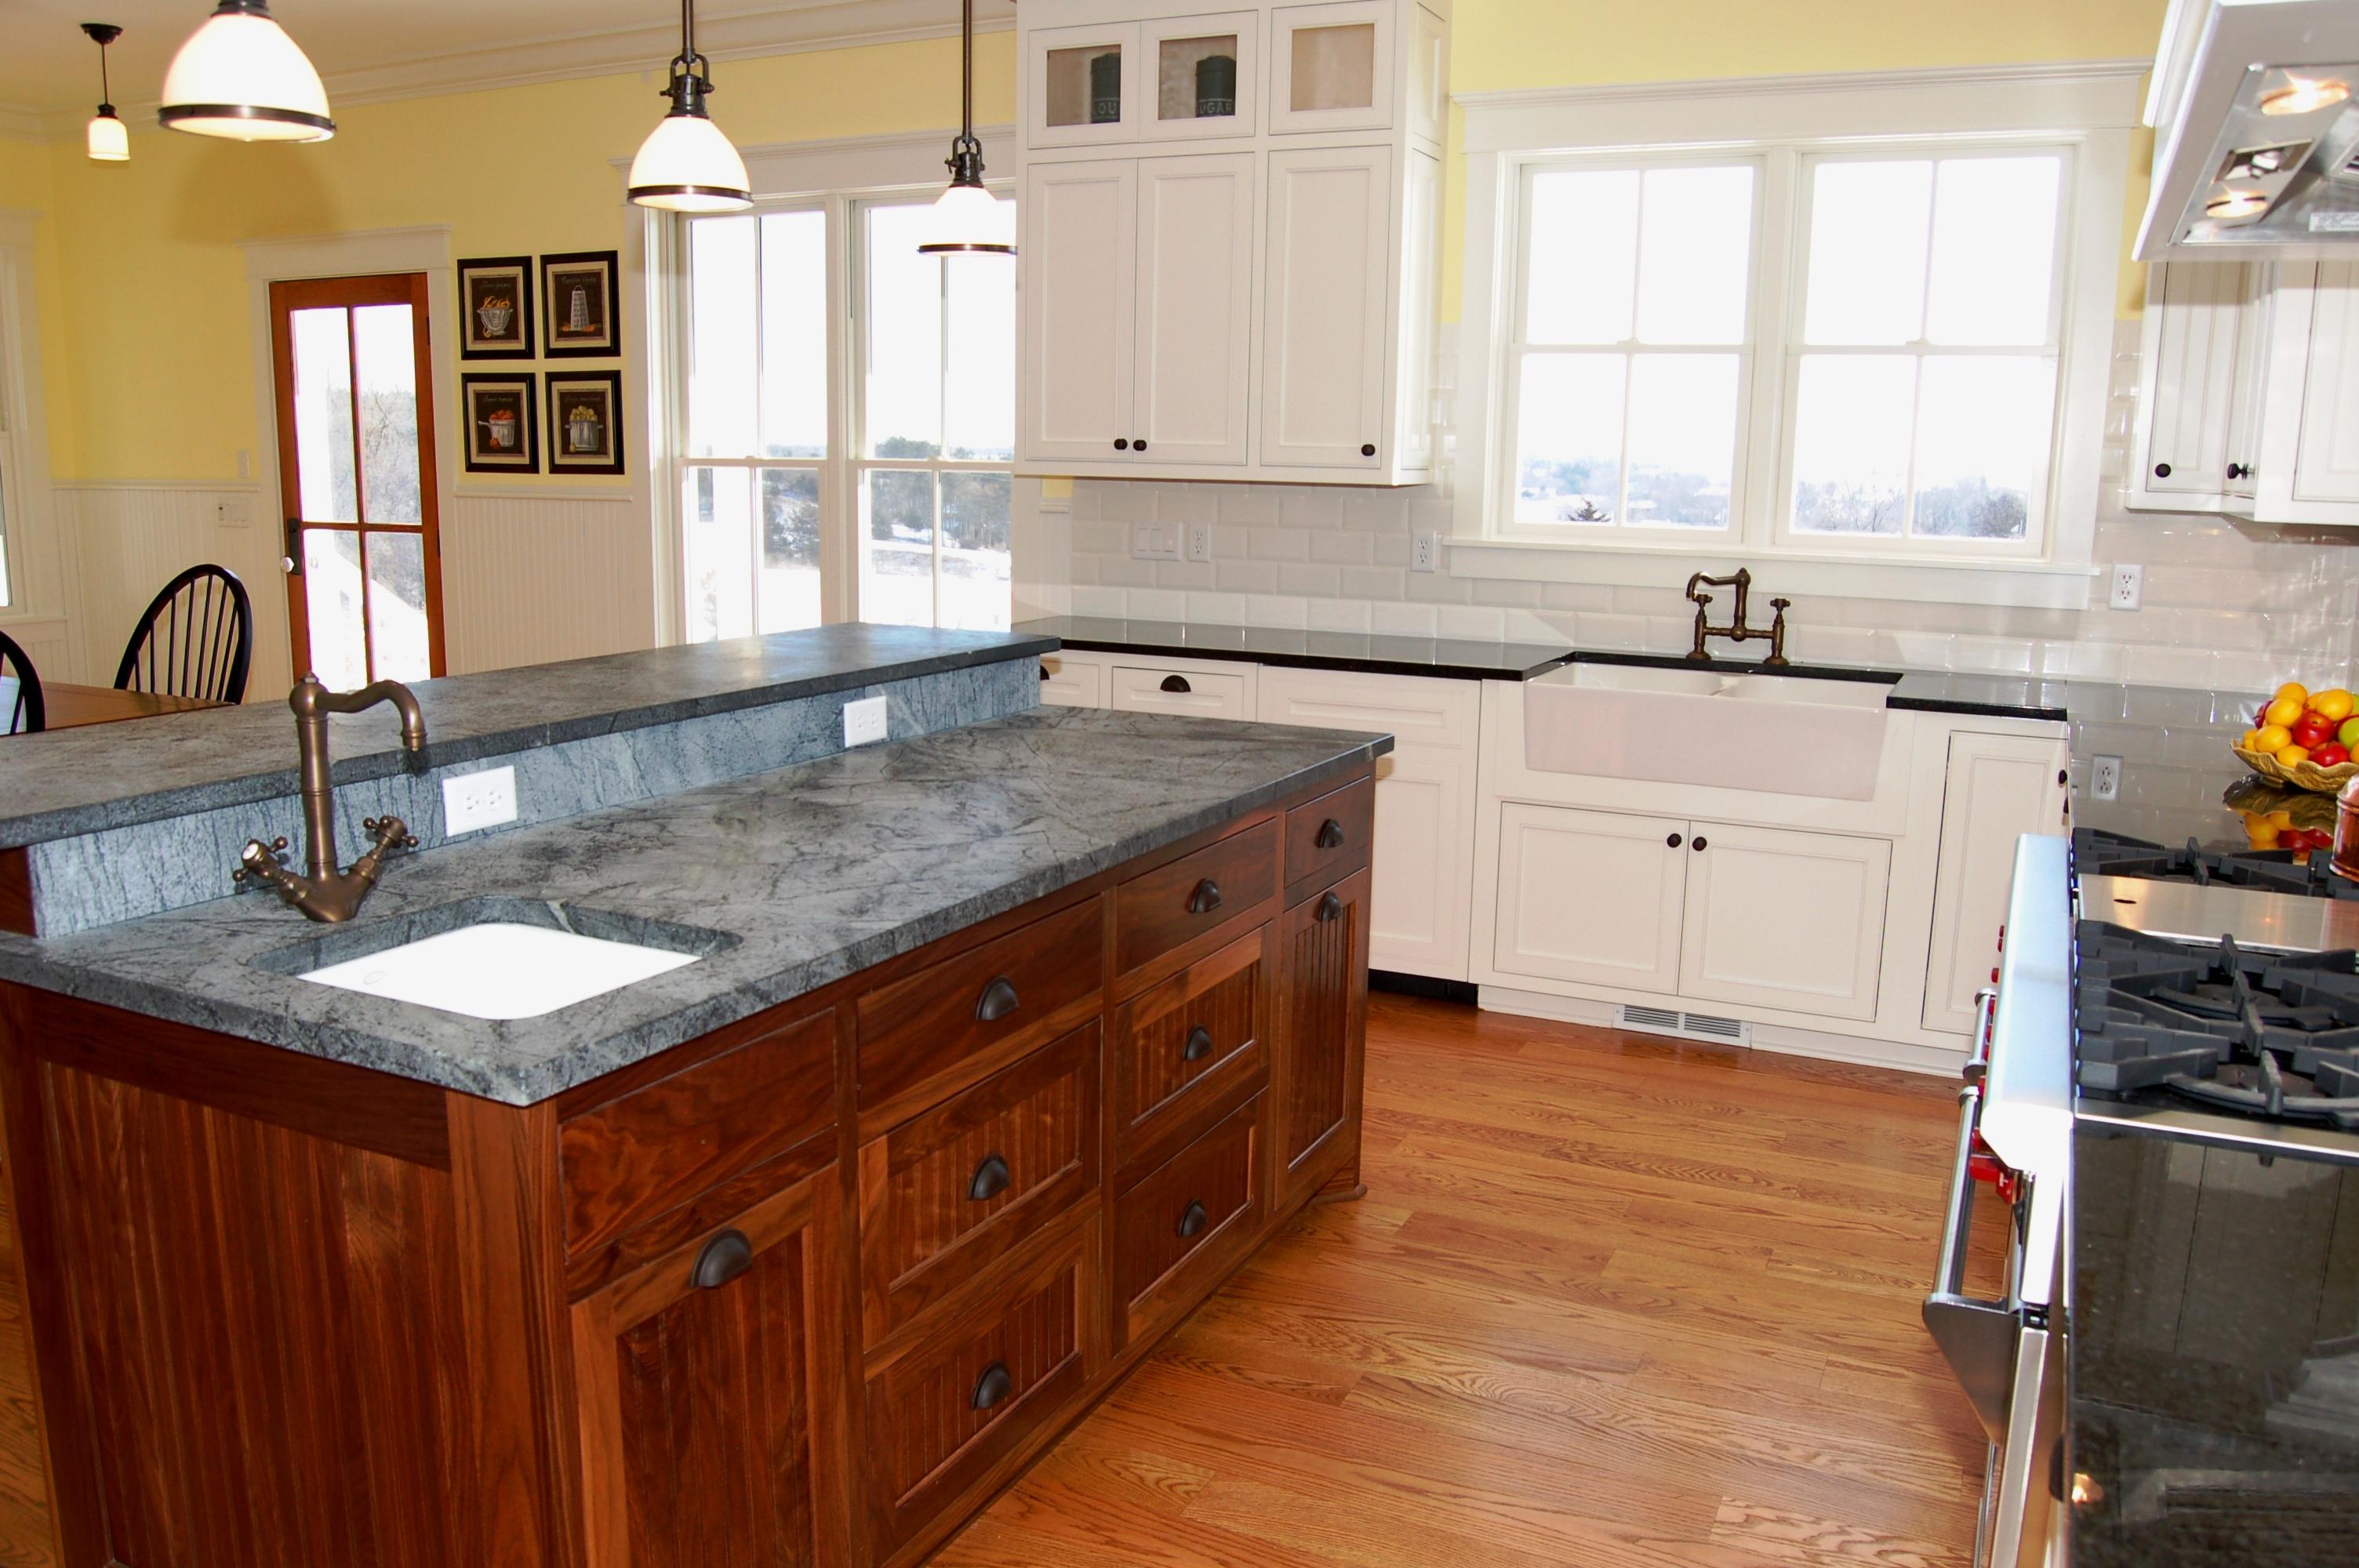 Bon Modern Classic Nice Adorable Wonderful Amazing Soapstone Kitchen Design  With Nice Black And White Pattern Design